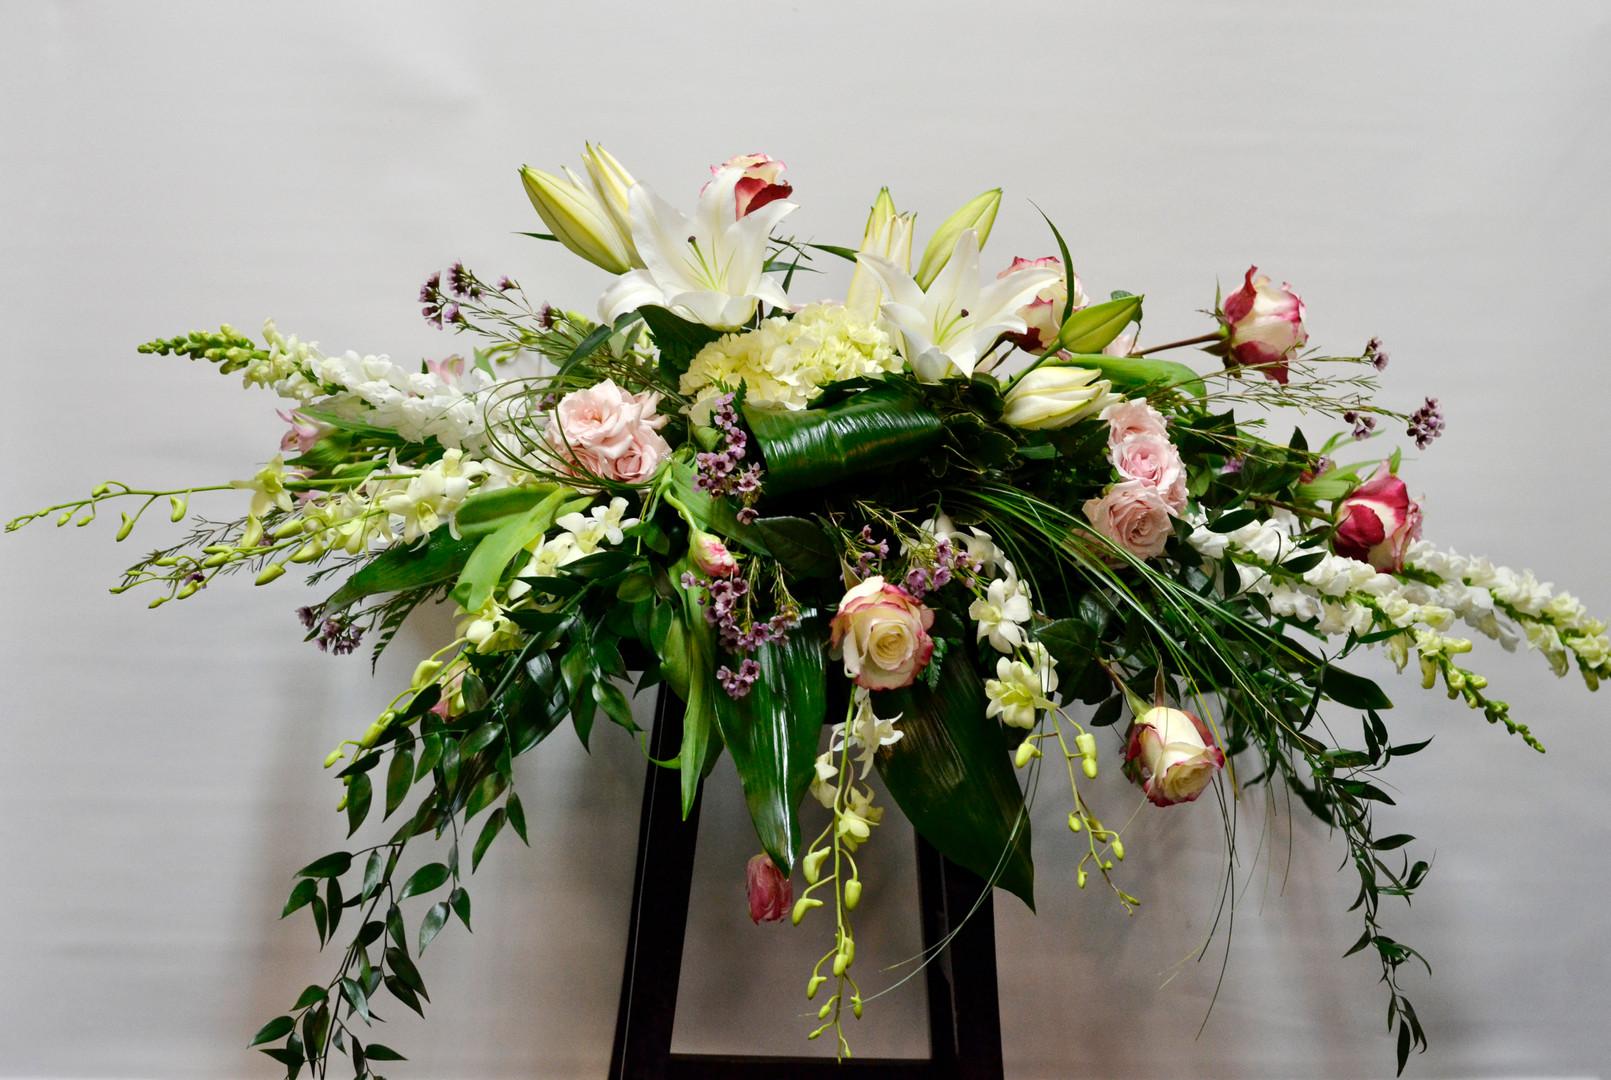 Arrangement cercueil 8